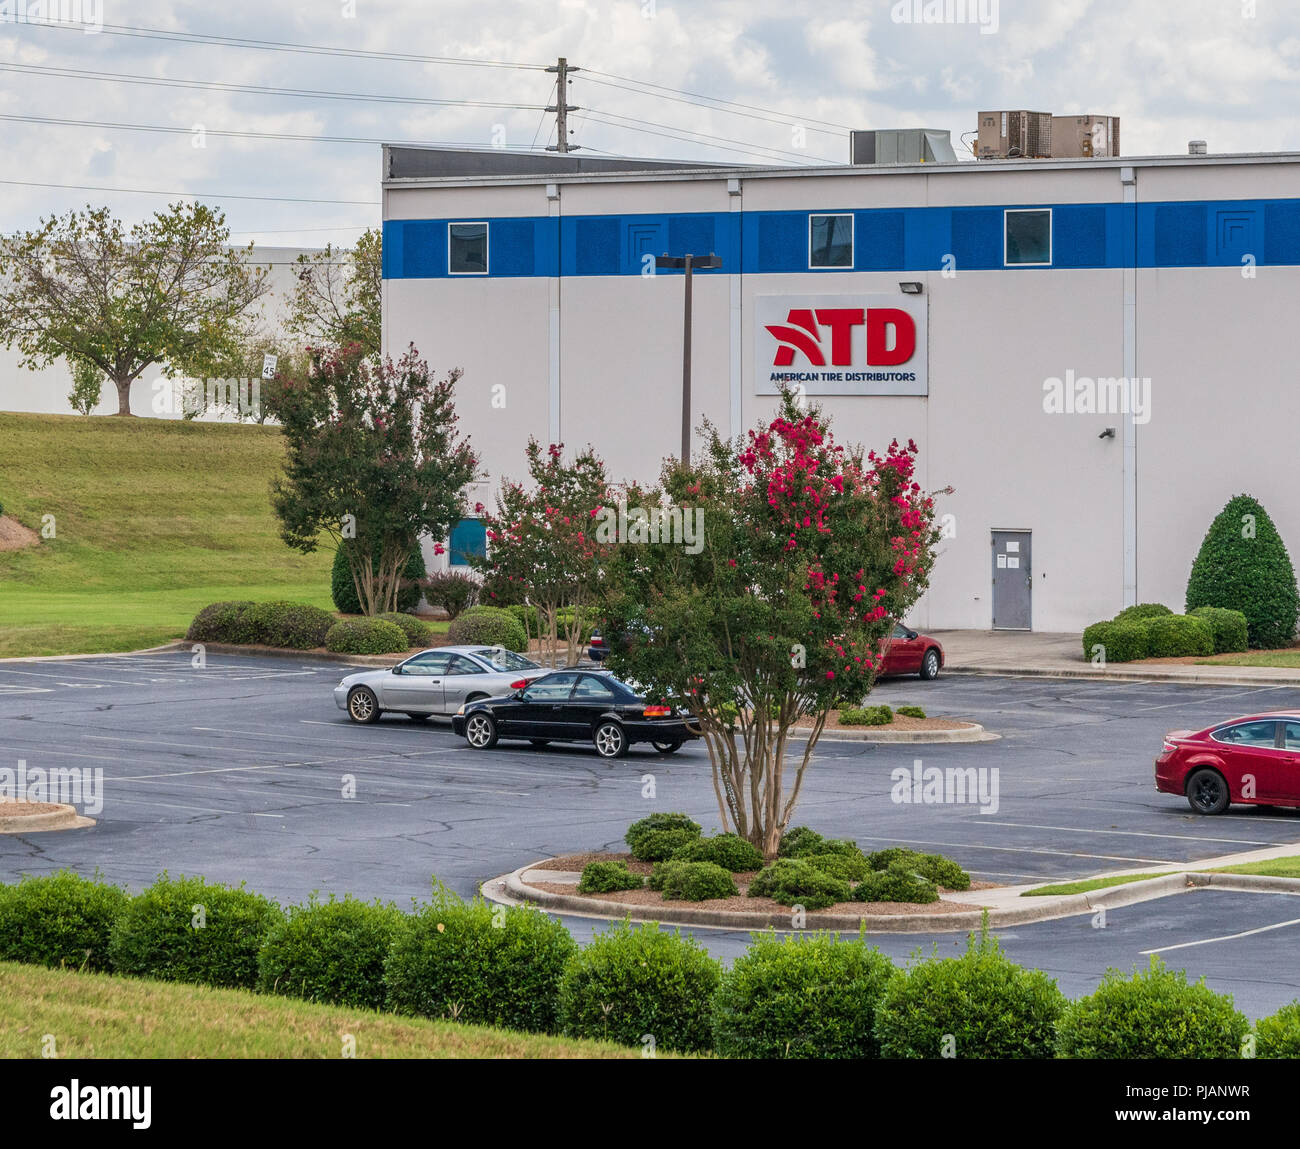 Lincolnton Nc Usa 9 2 18 Atd American Tire Distributors